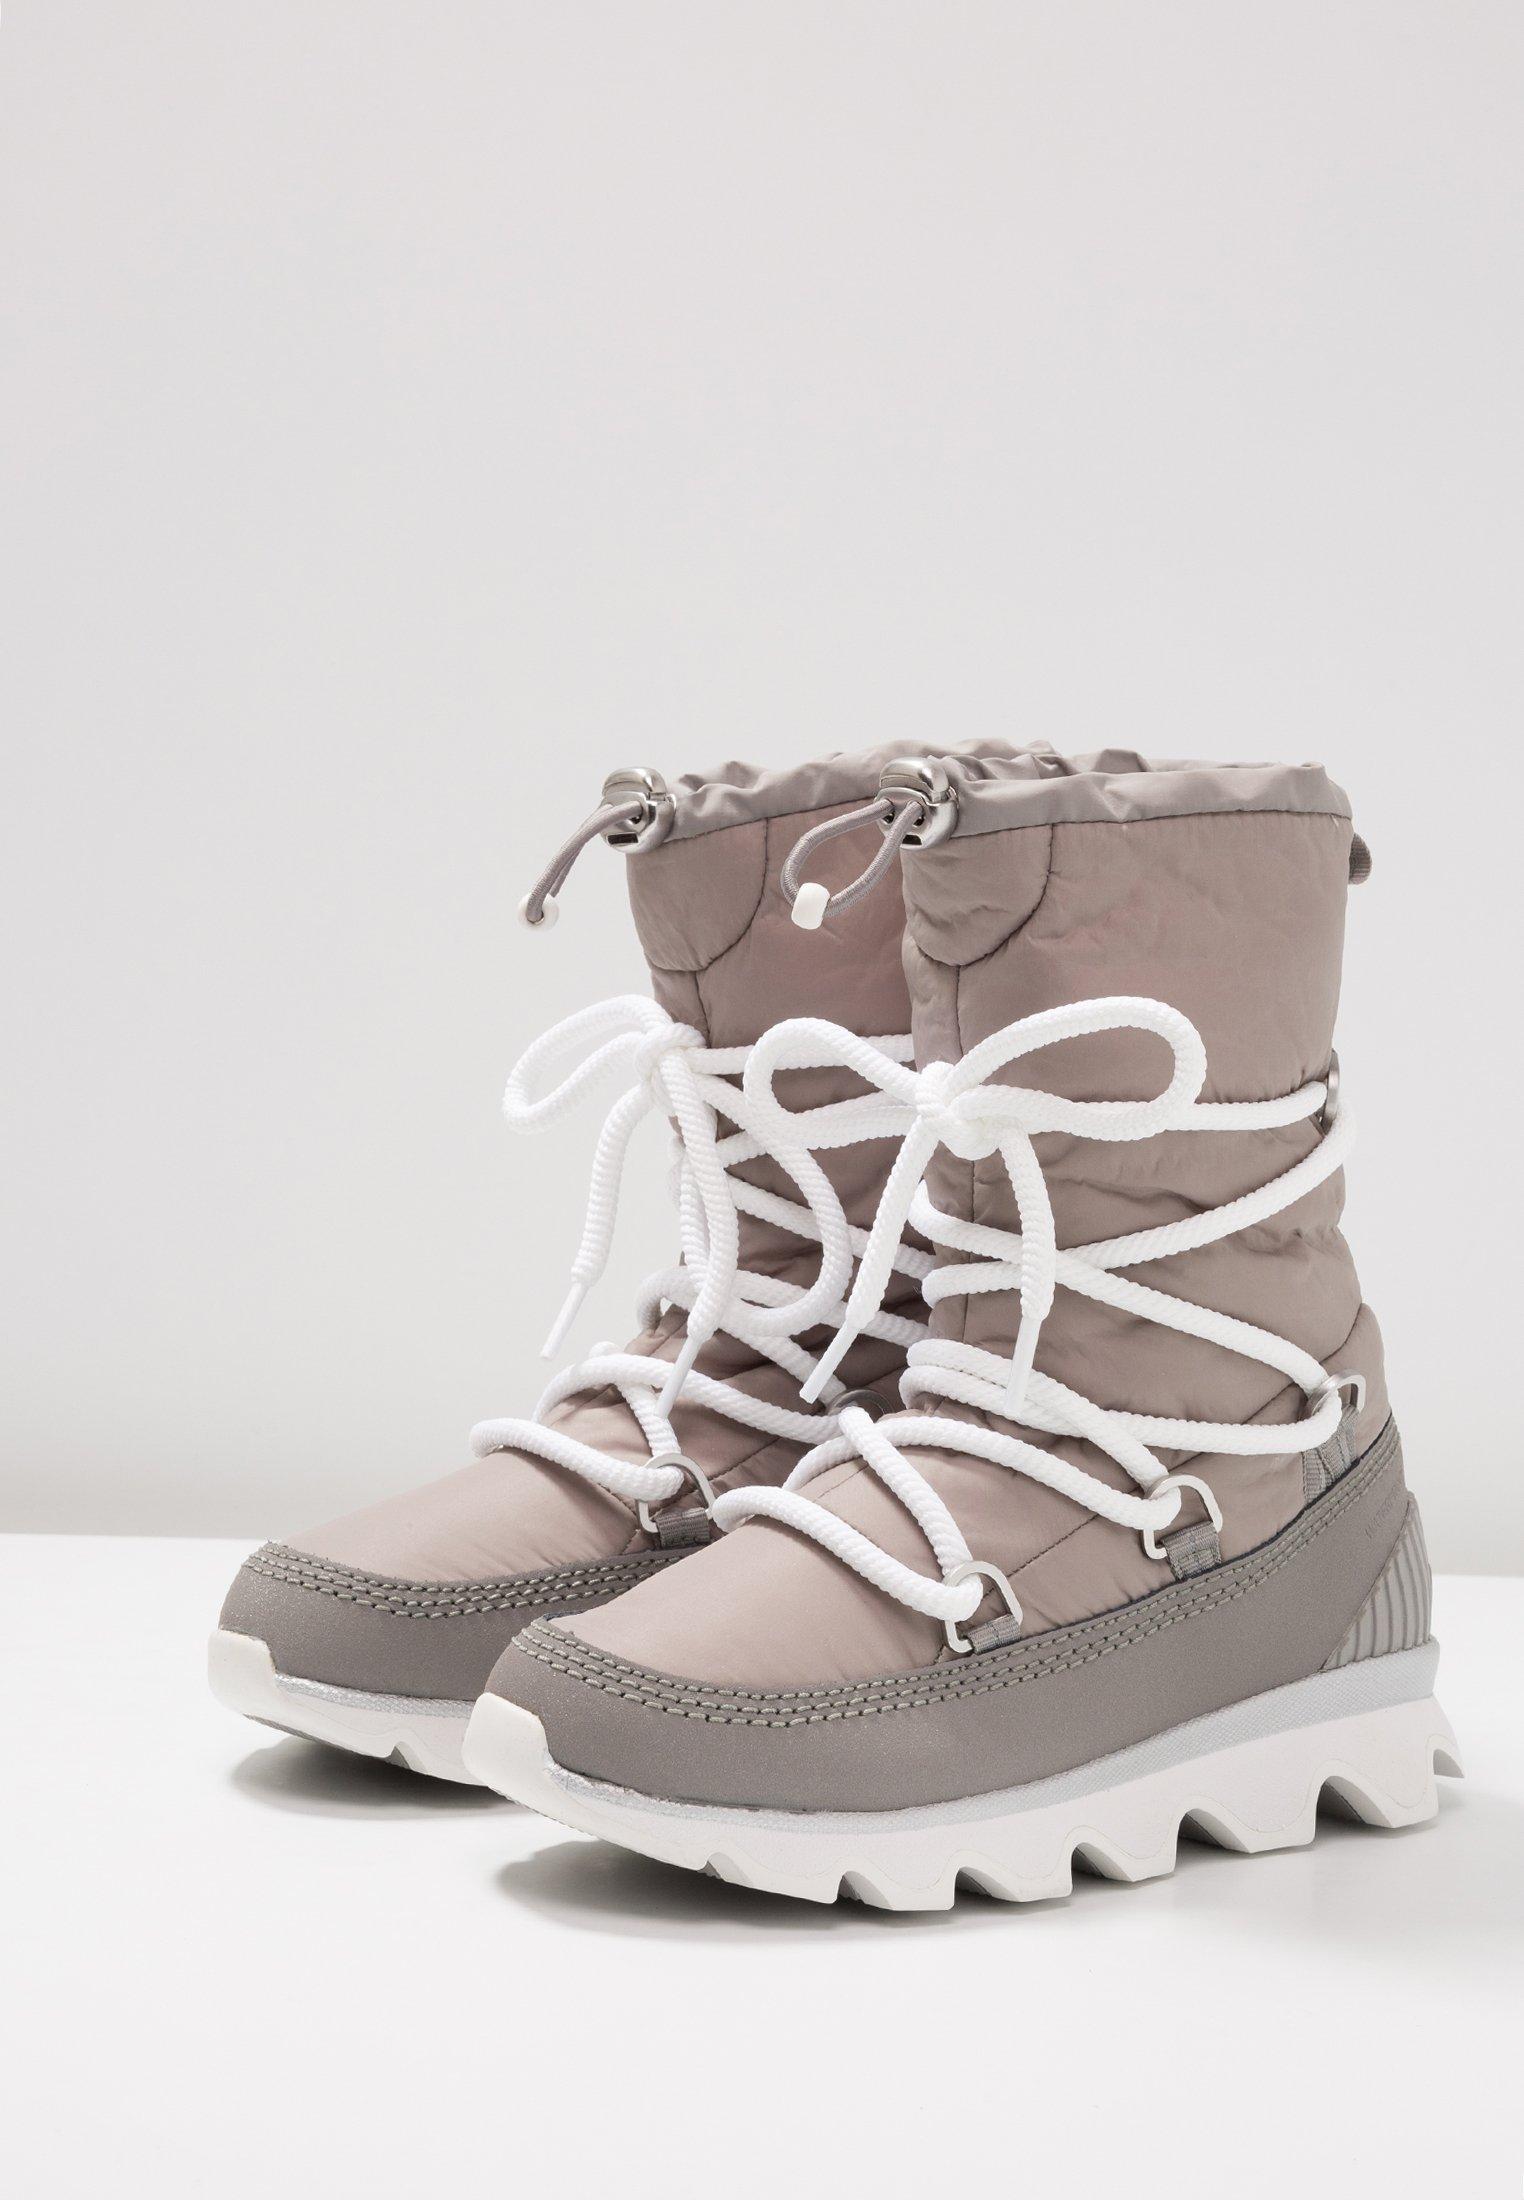 Sorel KINETIC - Bottes de neige chrome grey/white